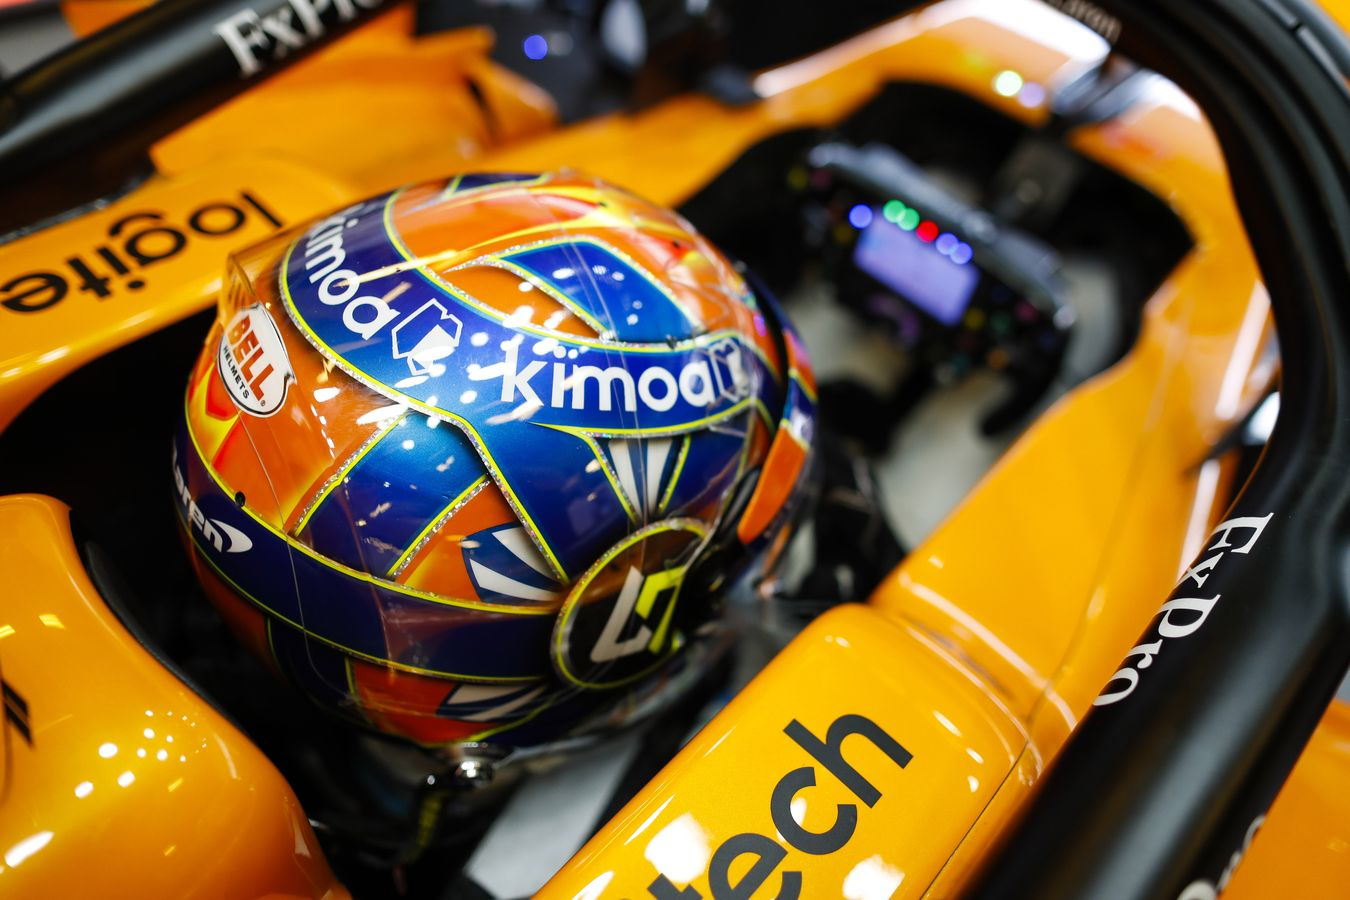 Lando Norris 2019 McLaren Formula 1 Driver Helmet Design